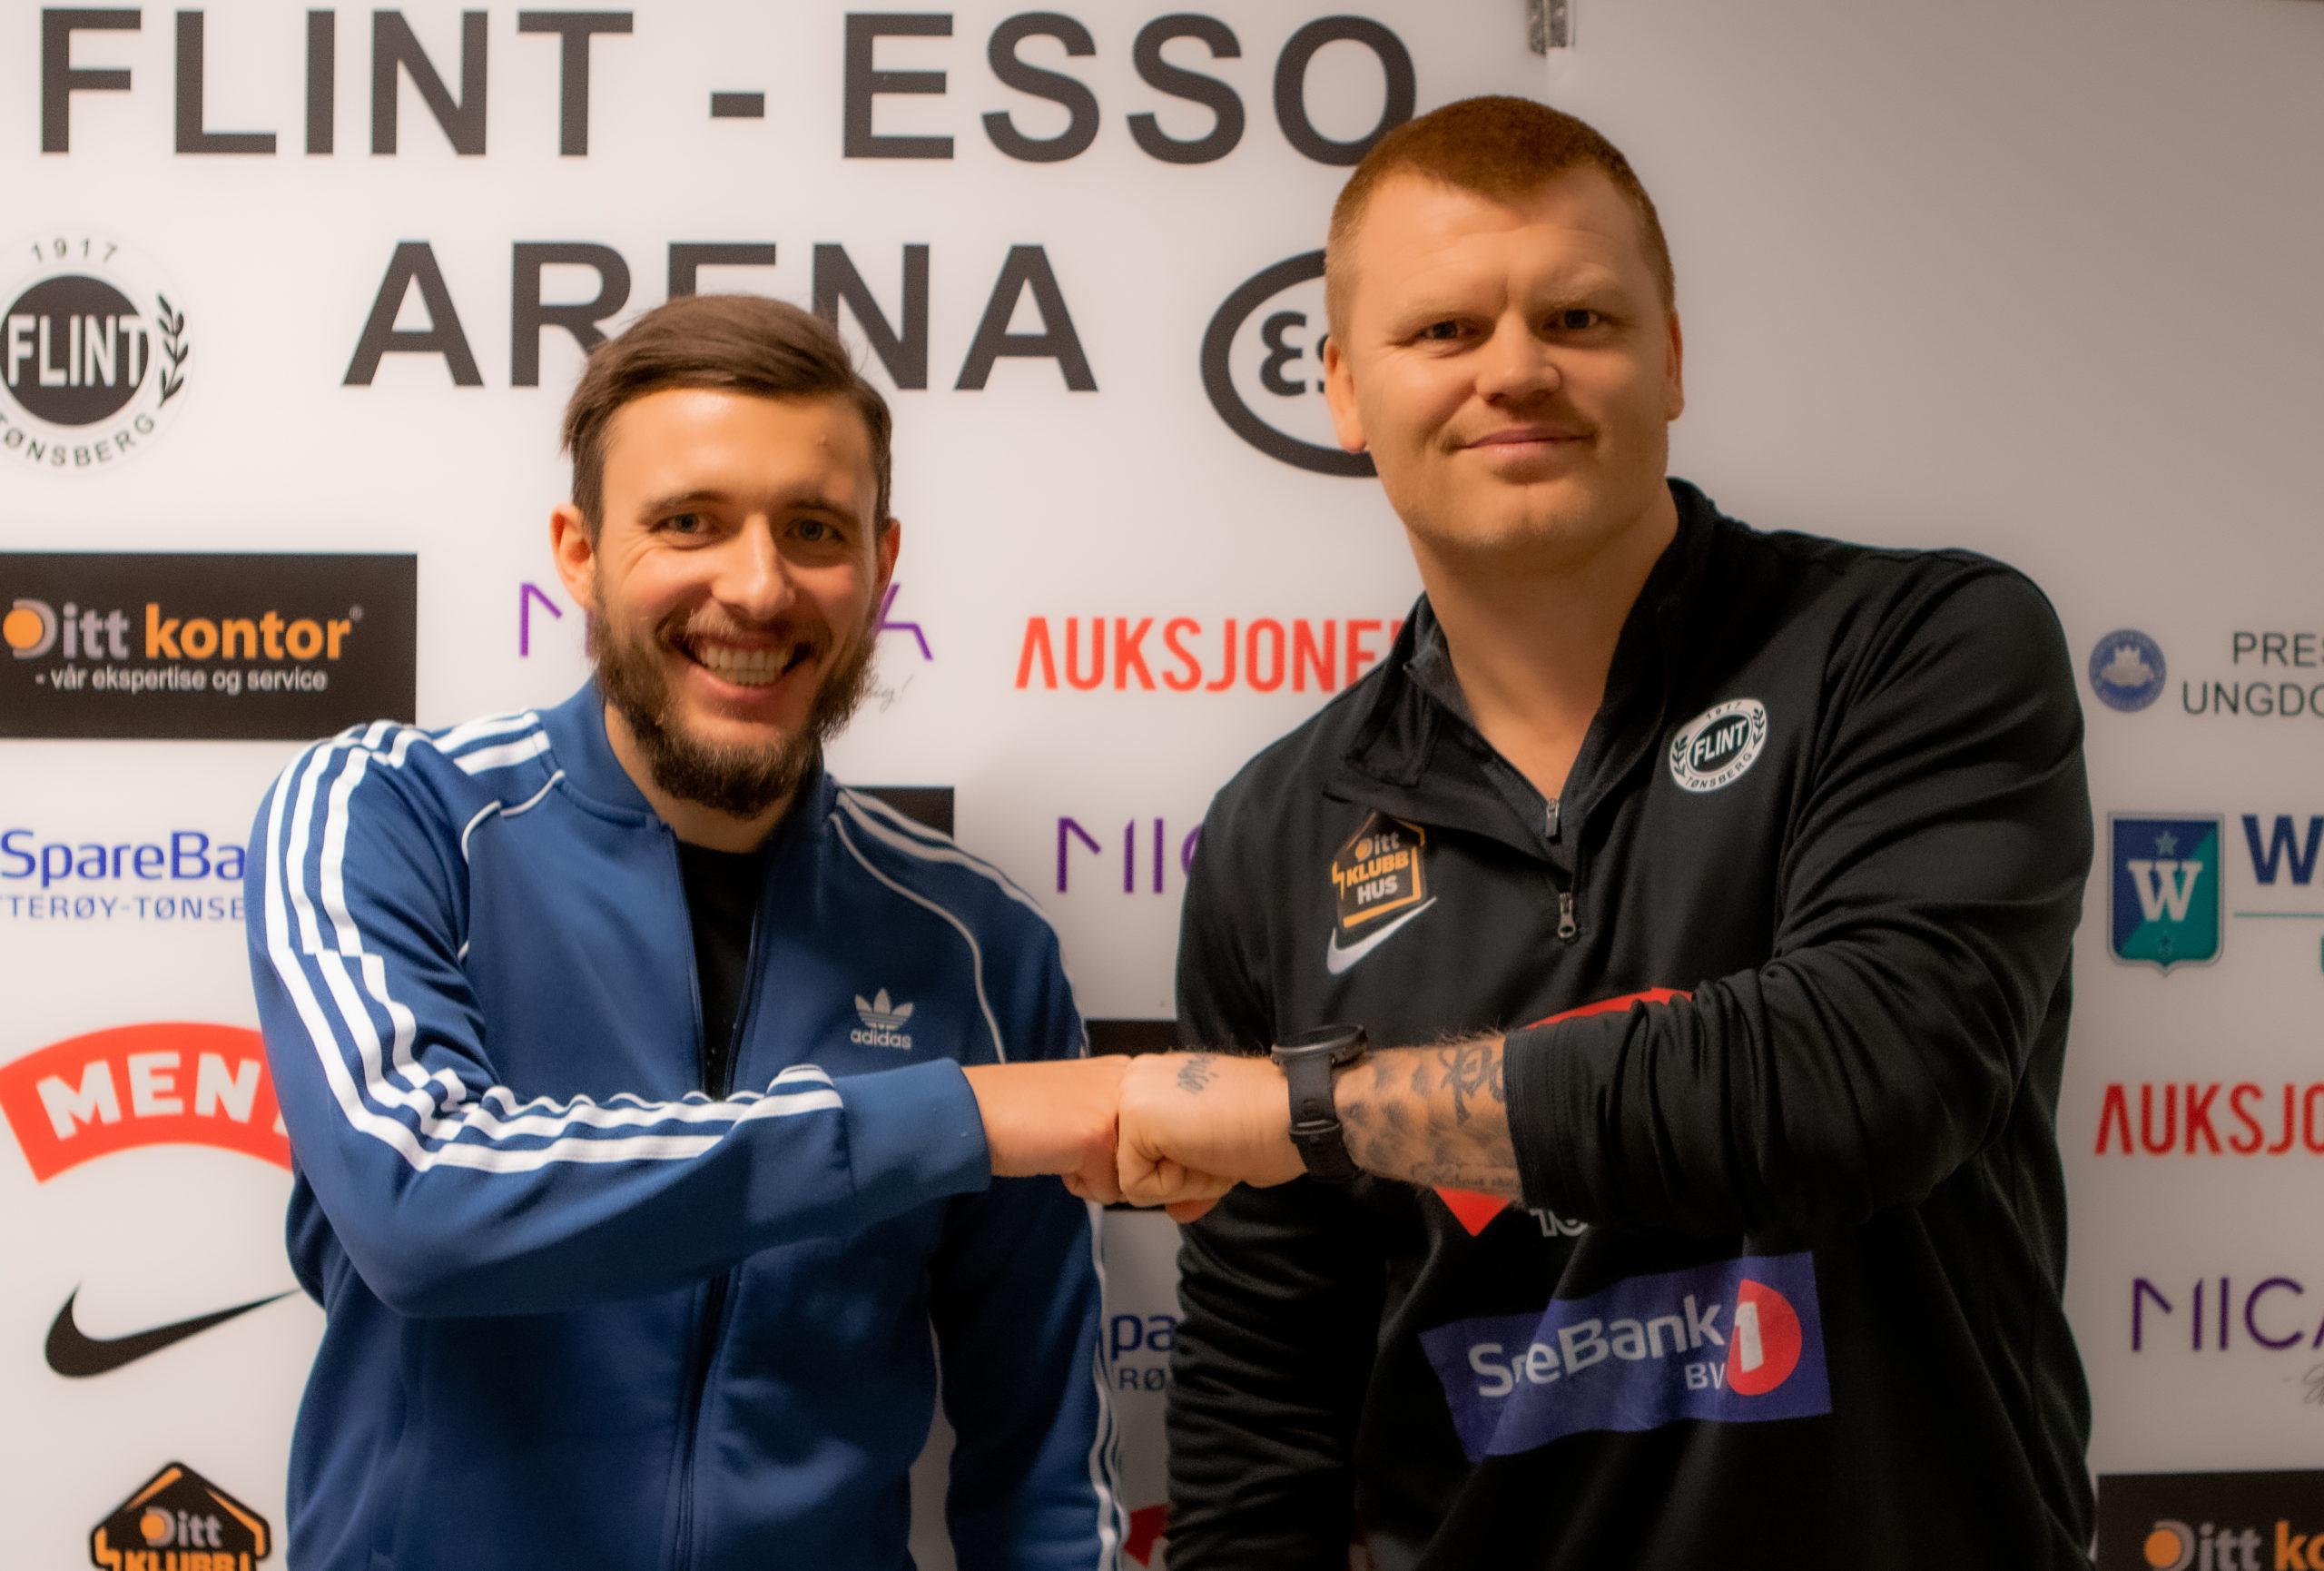 https://www.flintfotball.no/wp-content/uploads/2020/12/Adrian-Krysian-JAR-signering-2020-Flint-Fotball-1-scaled.jpg